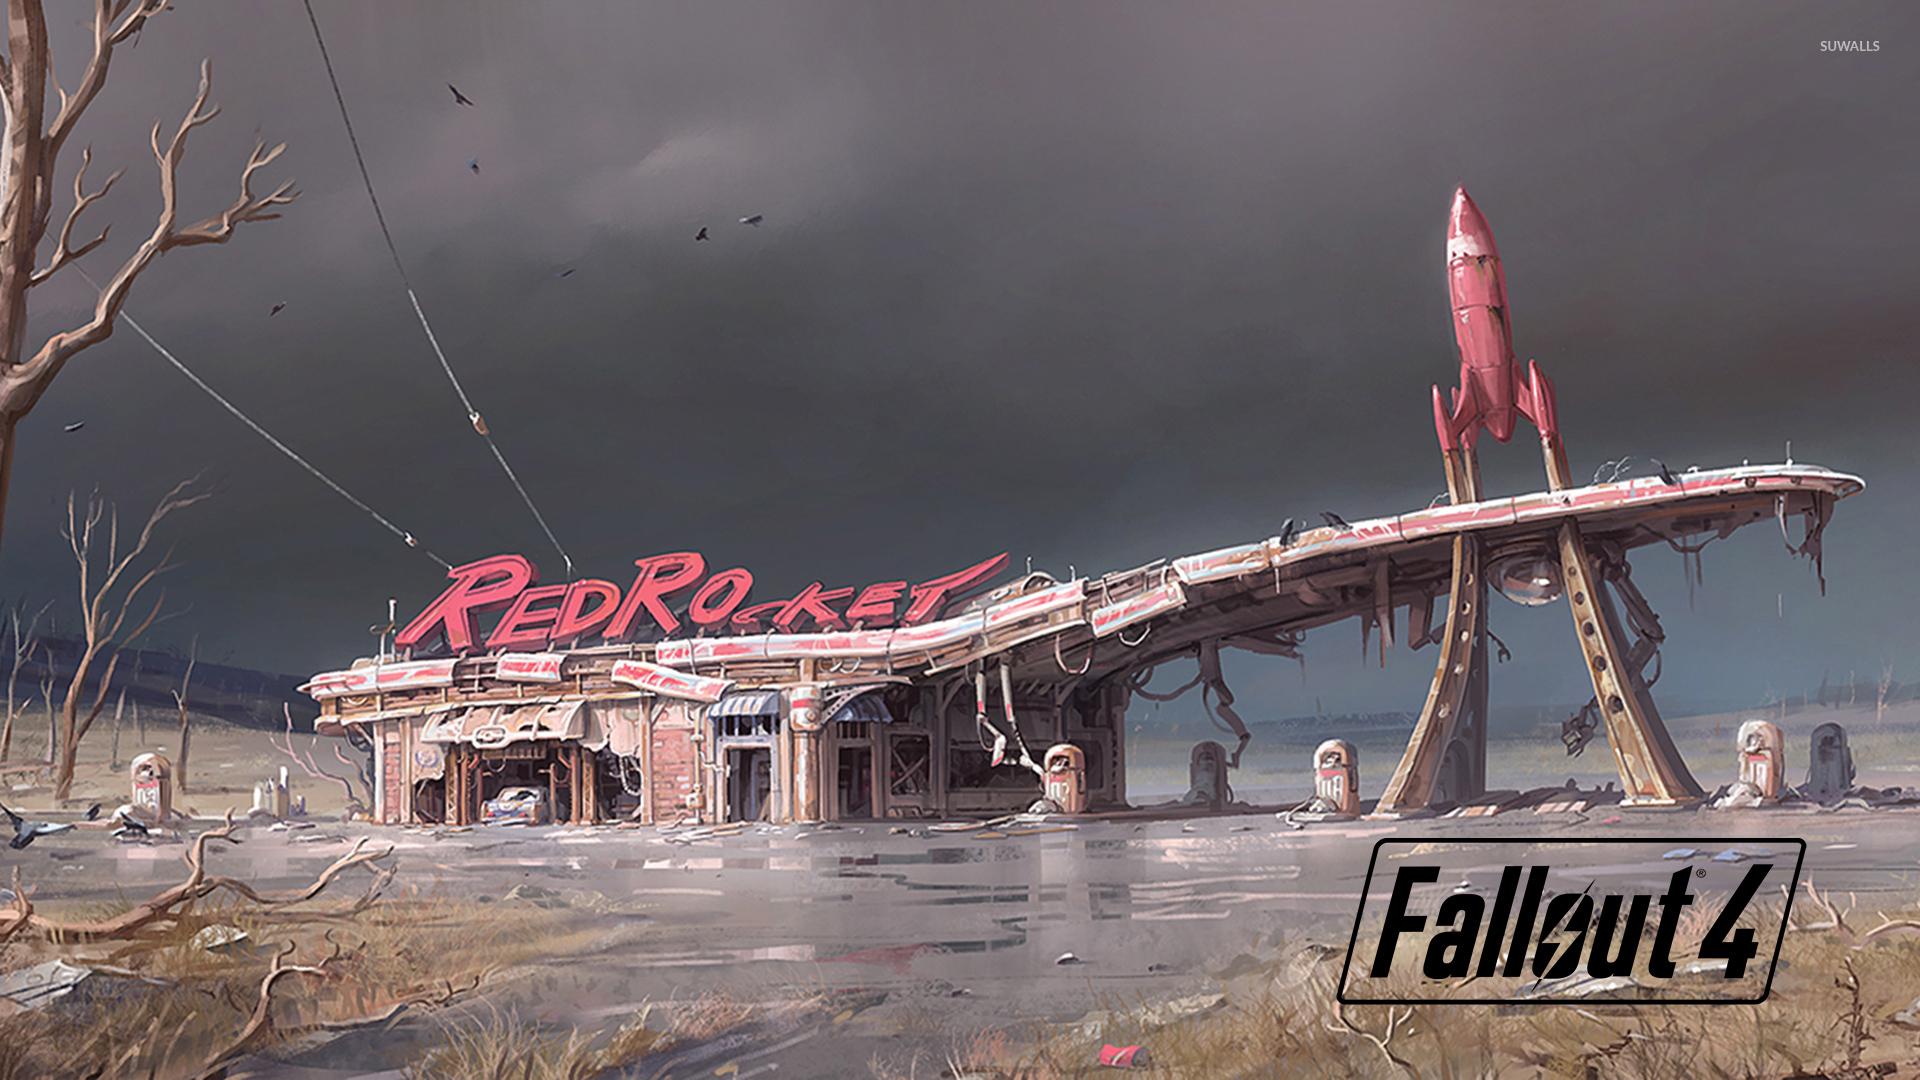 RedRocket In Fallout 4 Wallpaper